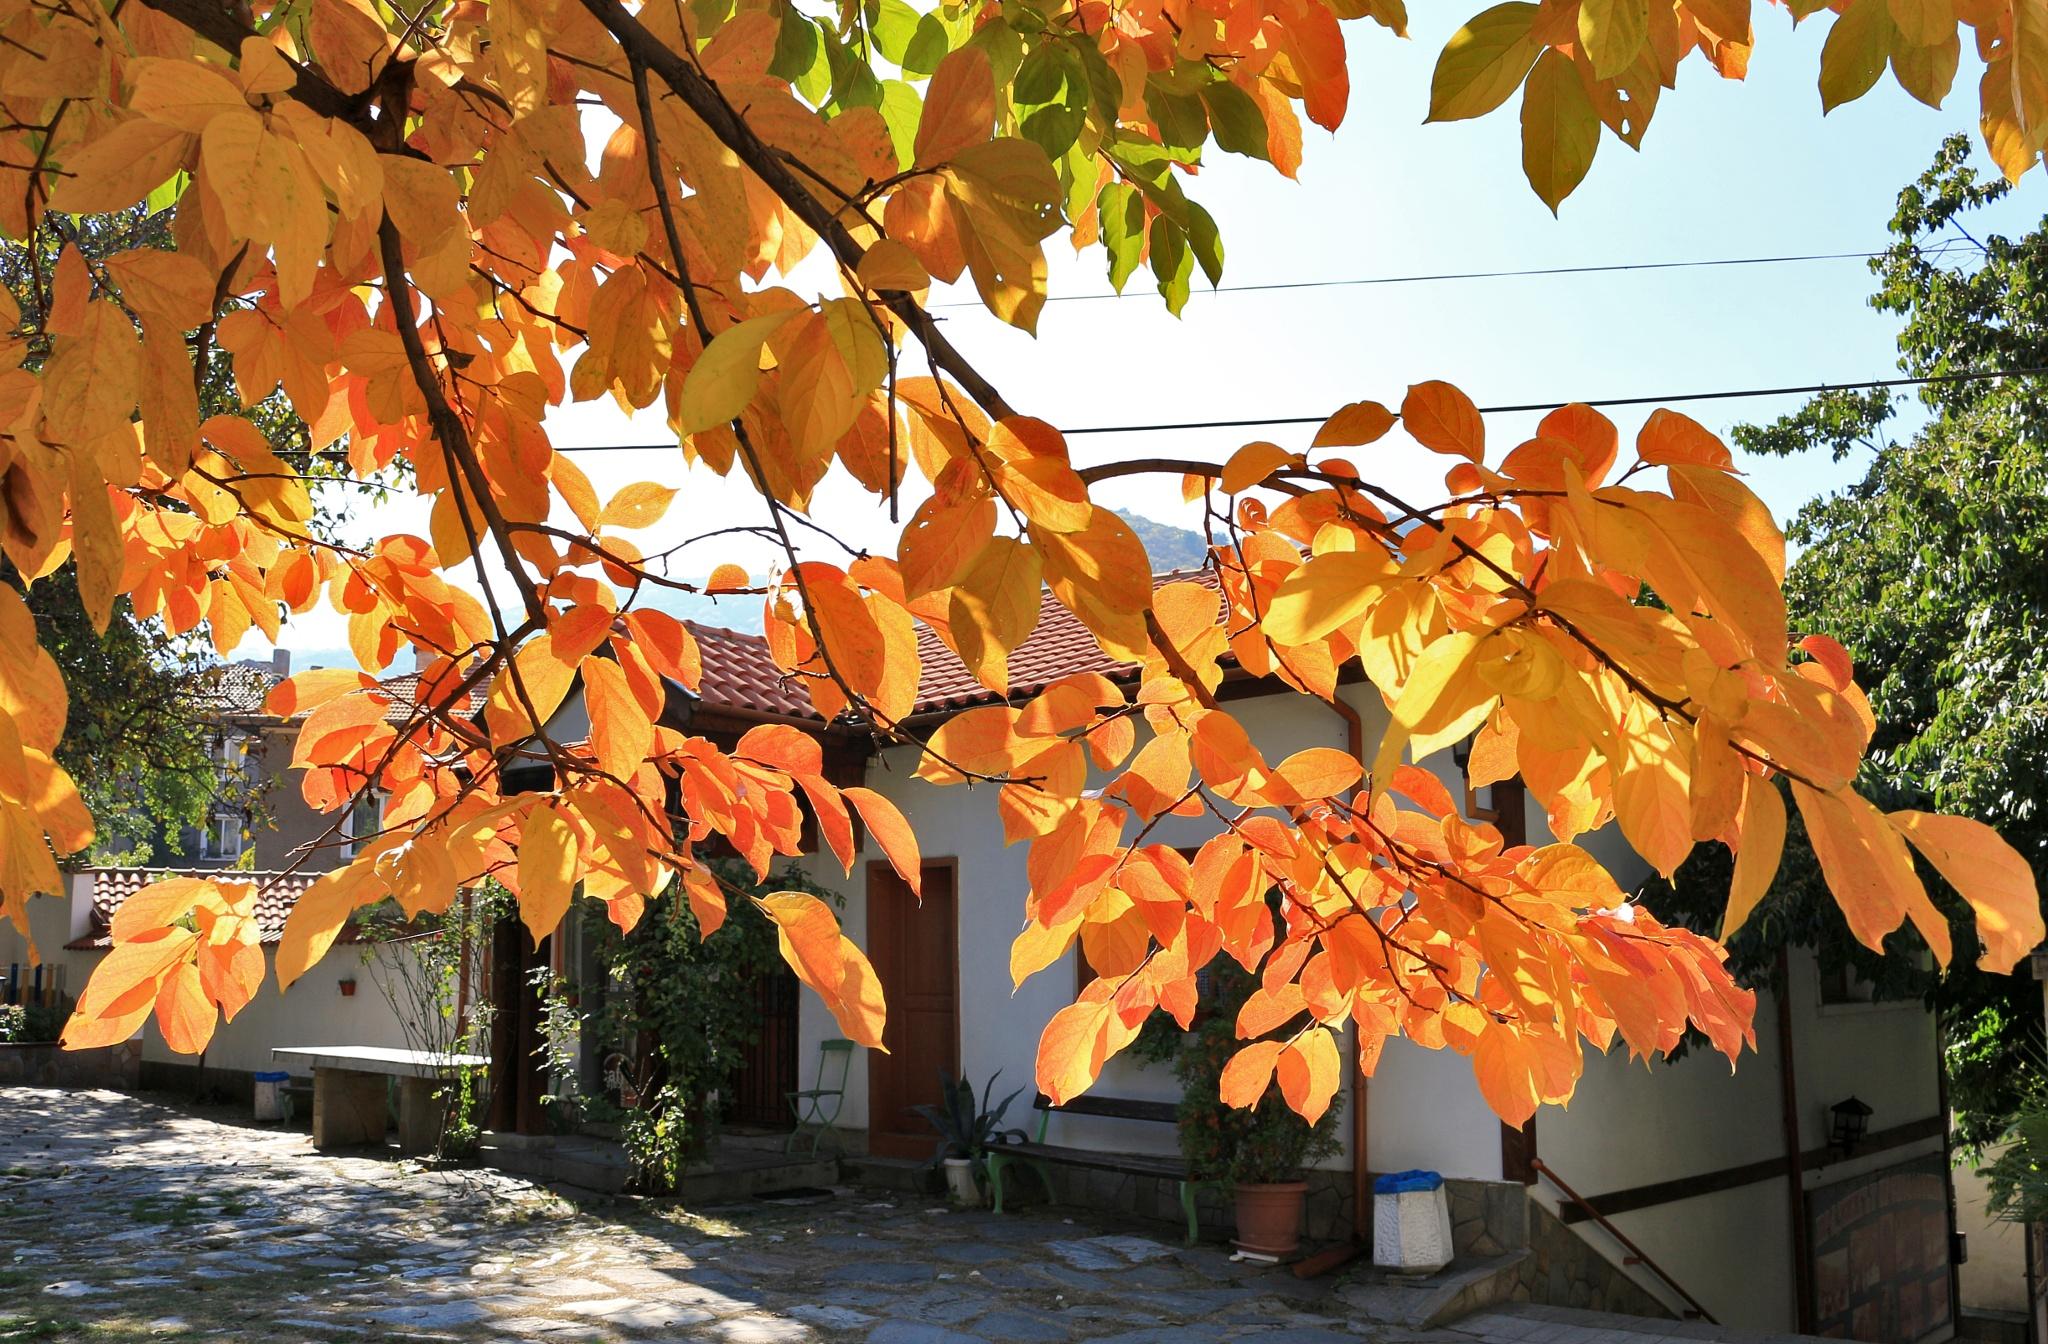 Autumn colors in the Saint Holy Virgin church garden by Sergey Sokolov